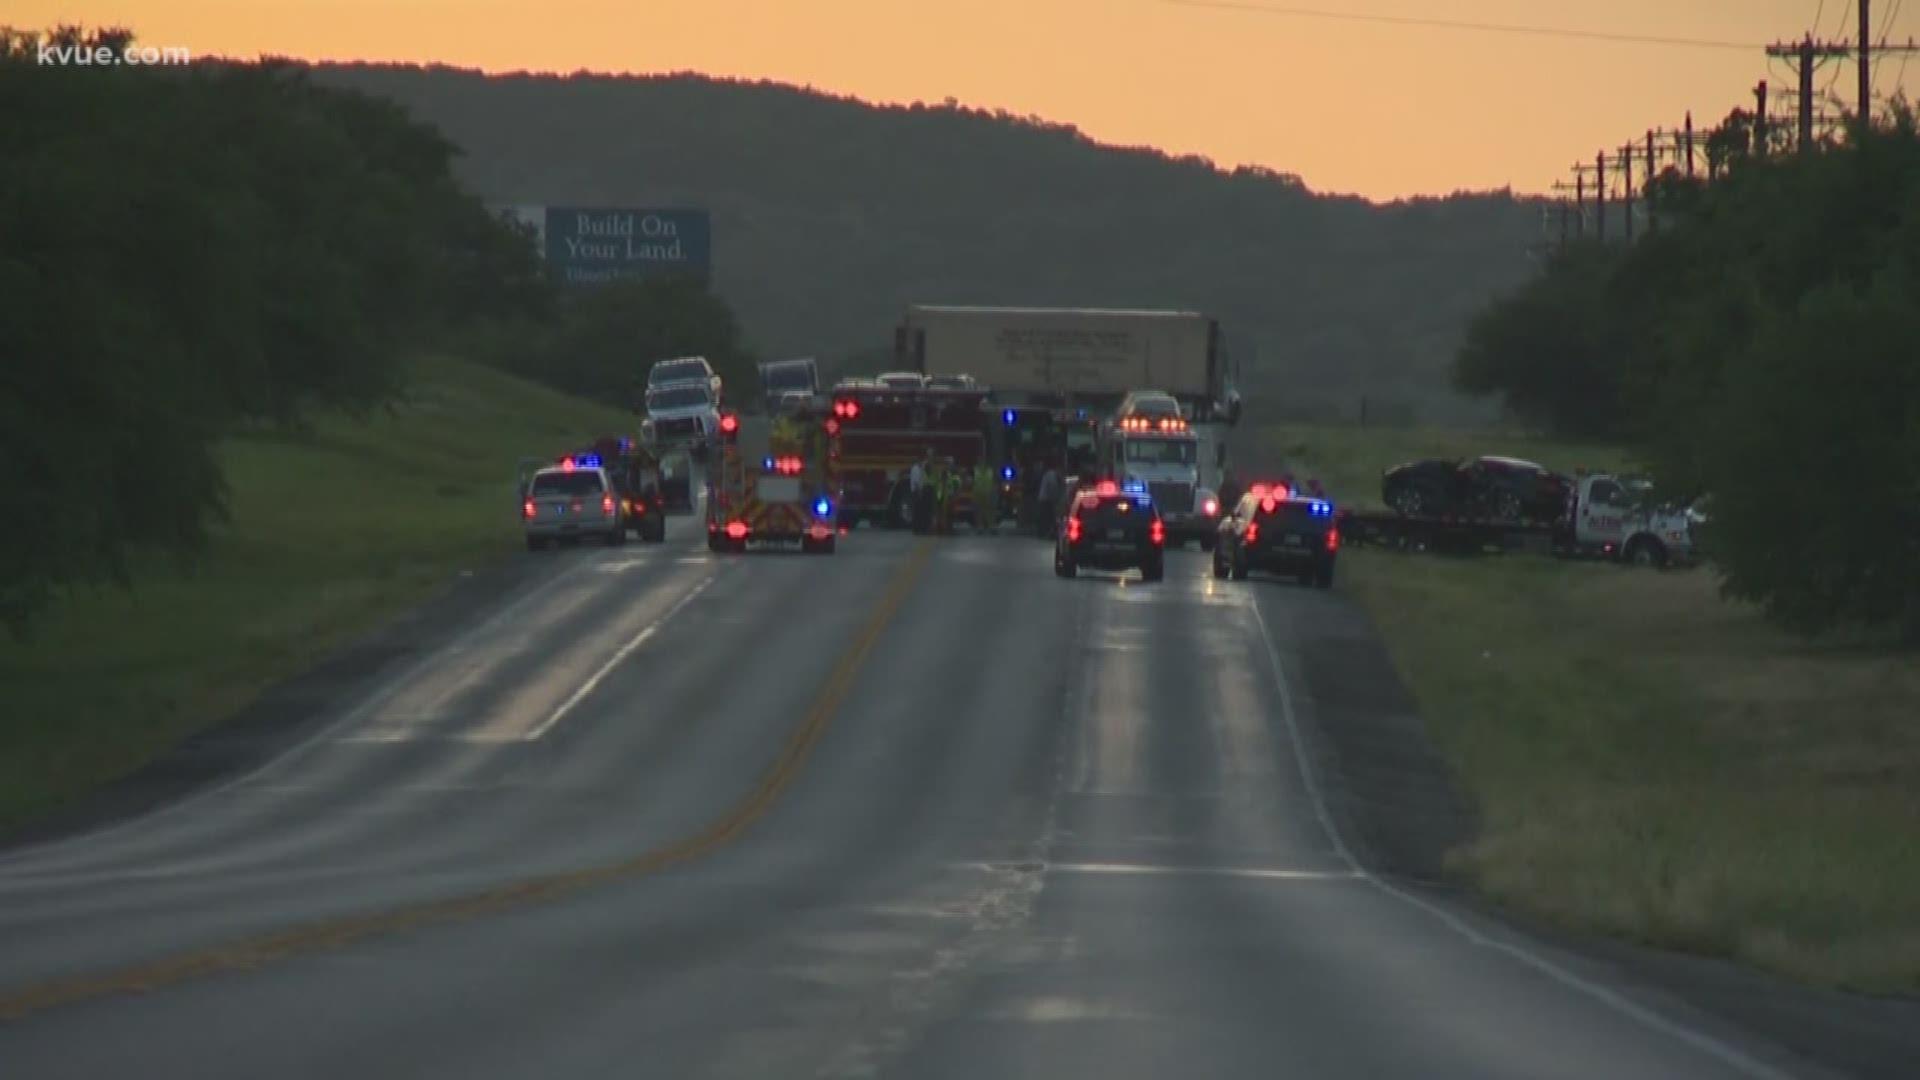 Marble Falls Student 17 Among Three Dead In Major Crash Along Highway 71 Kvue Com